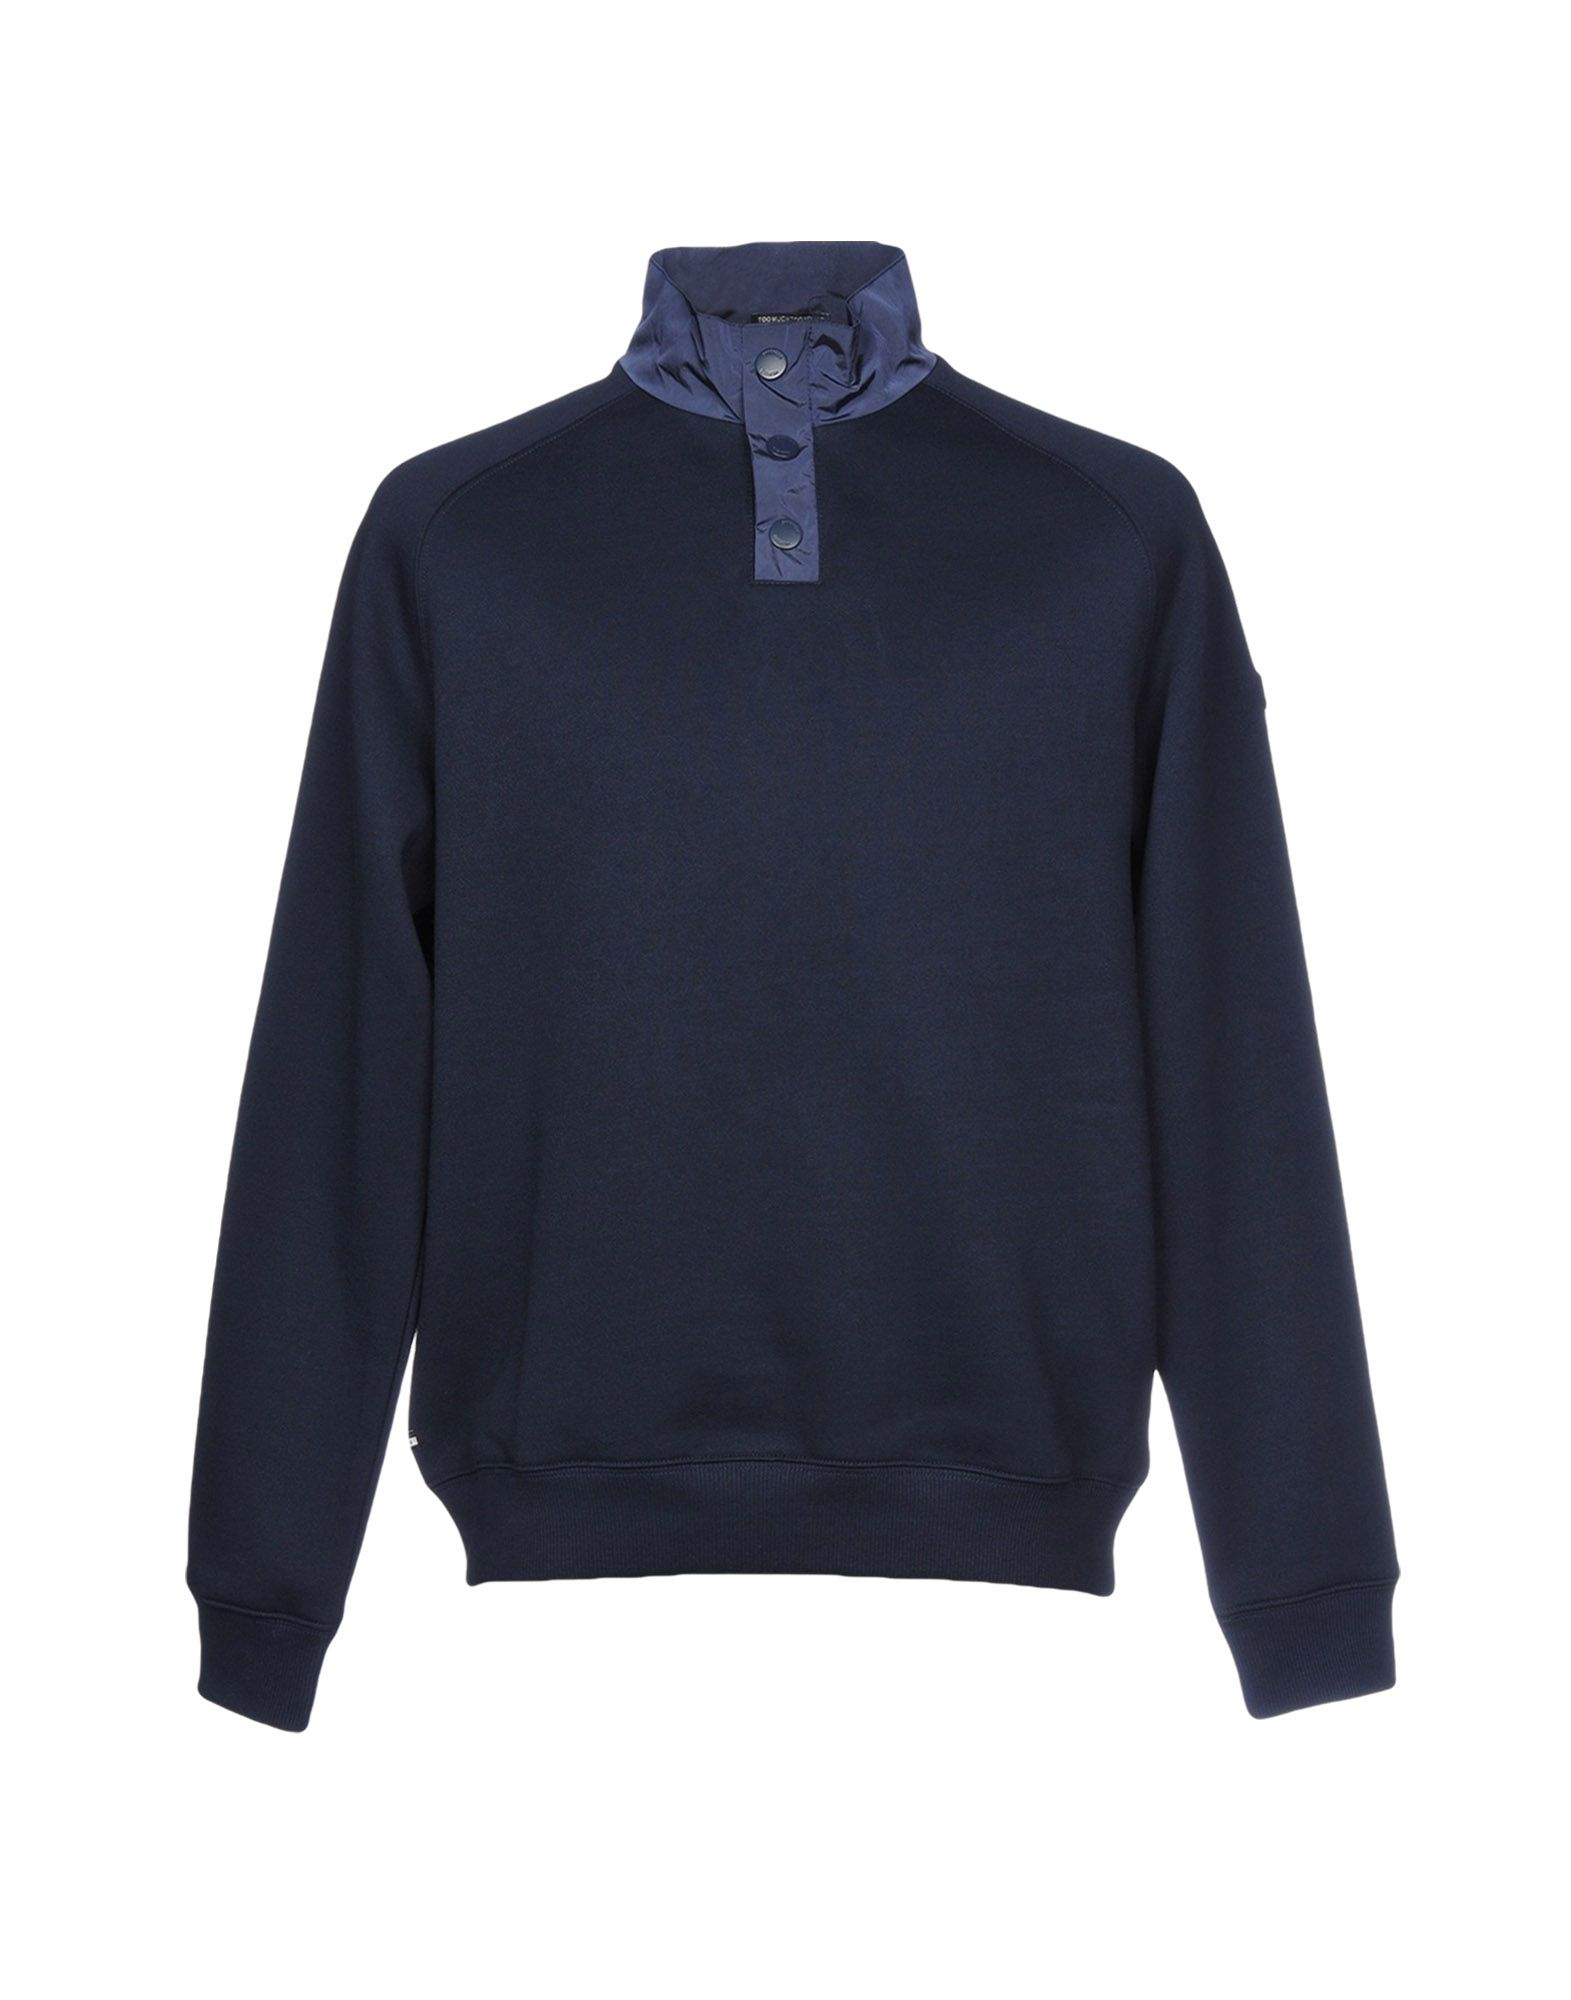 WEEKEND OFFENDER Sweatshirt in Dark Blue